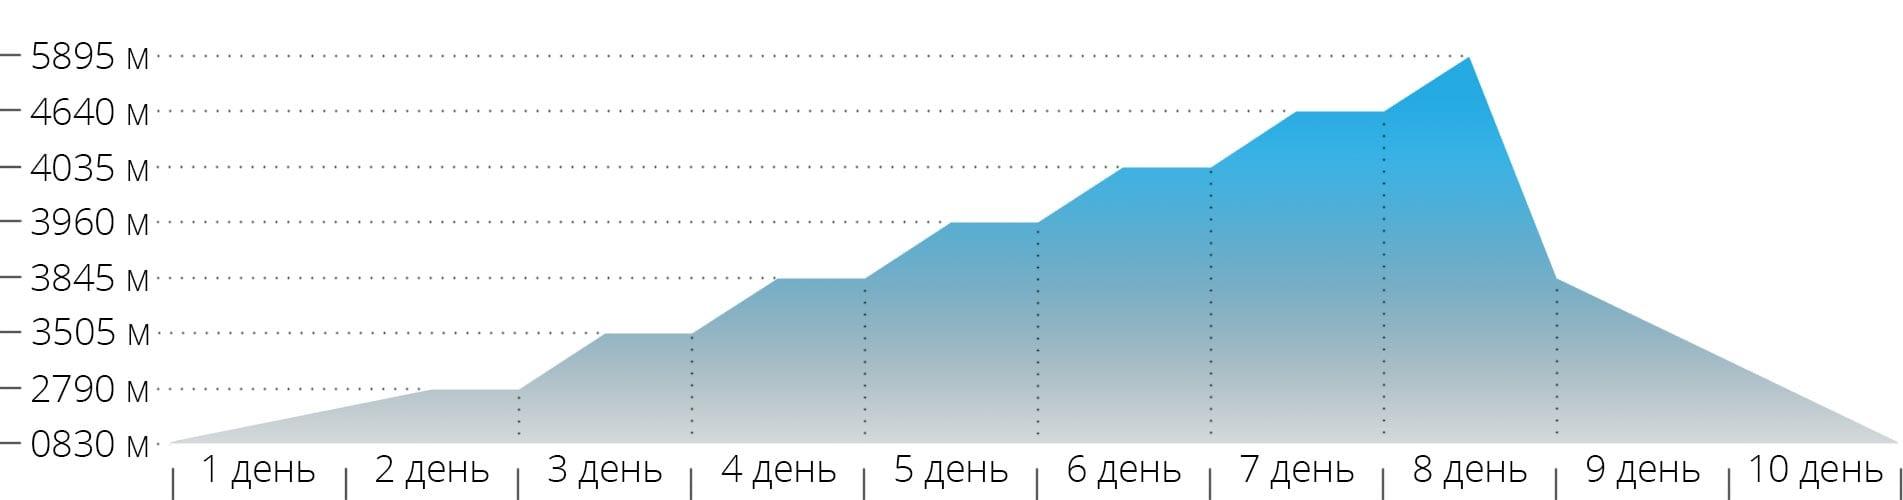 Акклиматизационный график для маршрута Лемошо на Килиманджаро